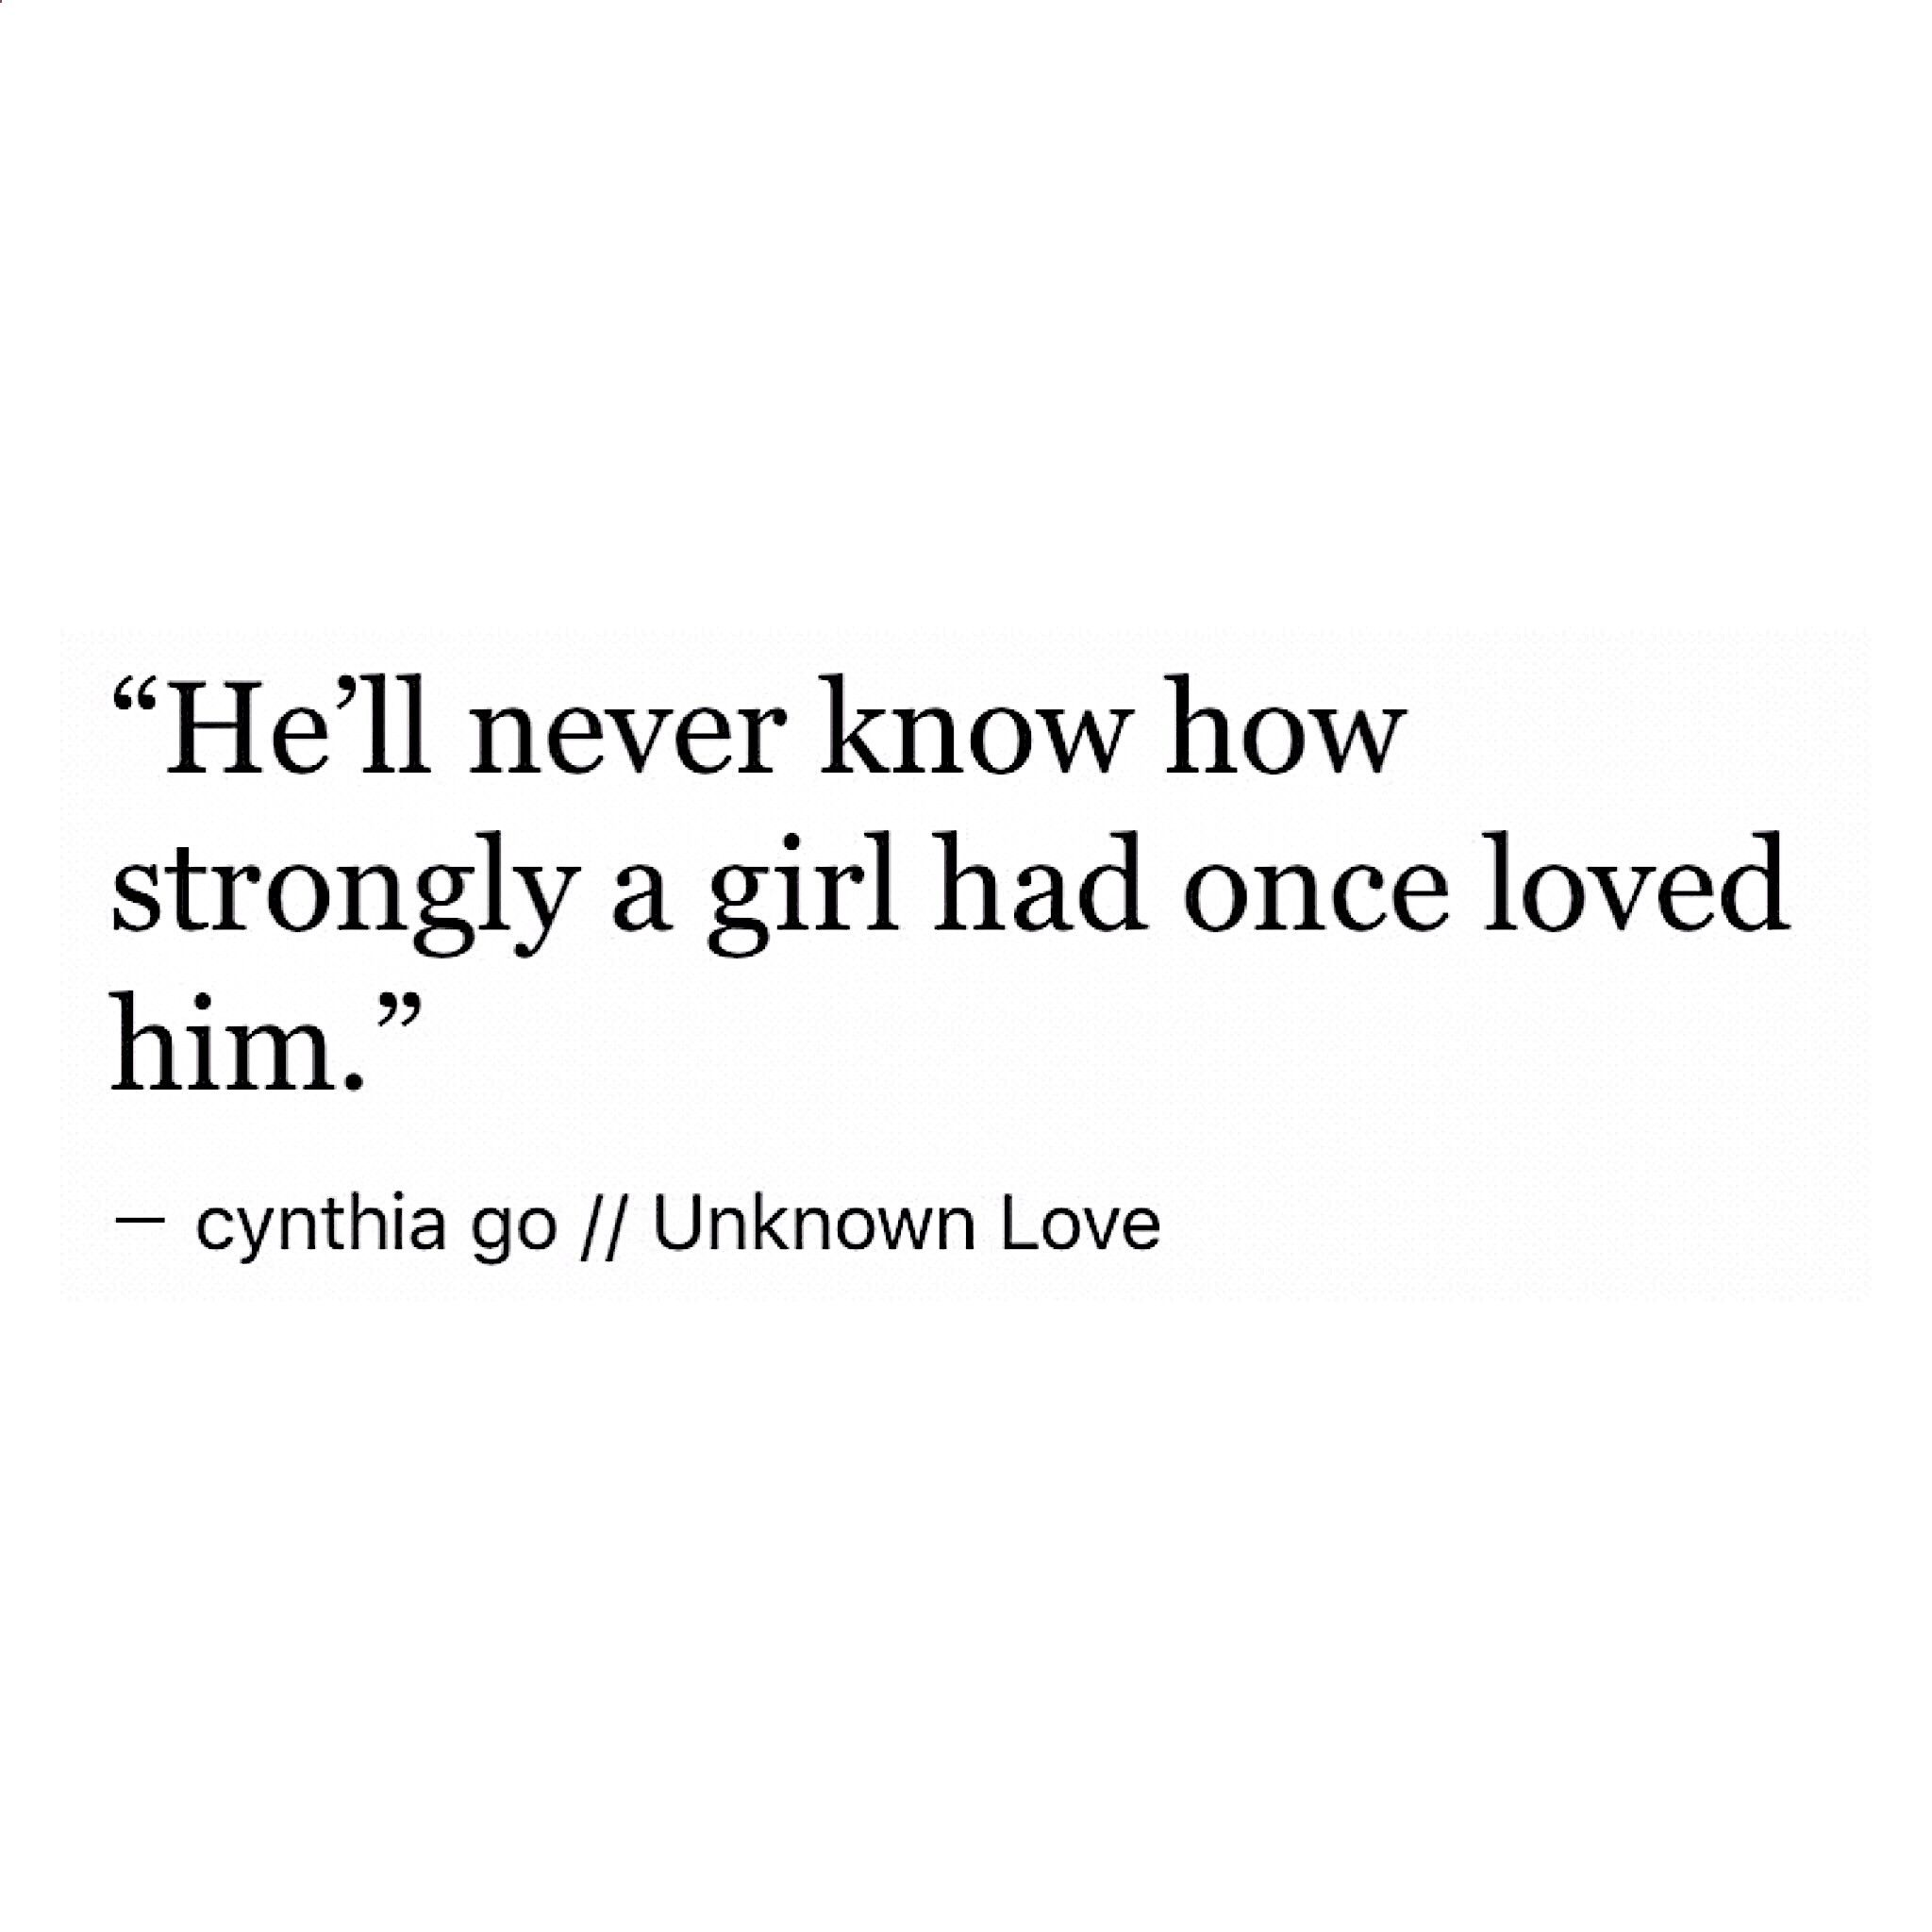 pinterest: cynthia_go | cynthia go, quotes, words, writing, love, unrequited love, heartbreak, secret love, breakup, writing, creative writing, tumblr, crush quotes